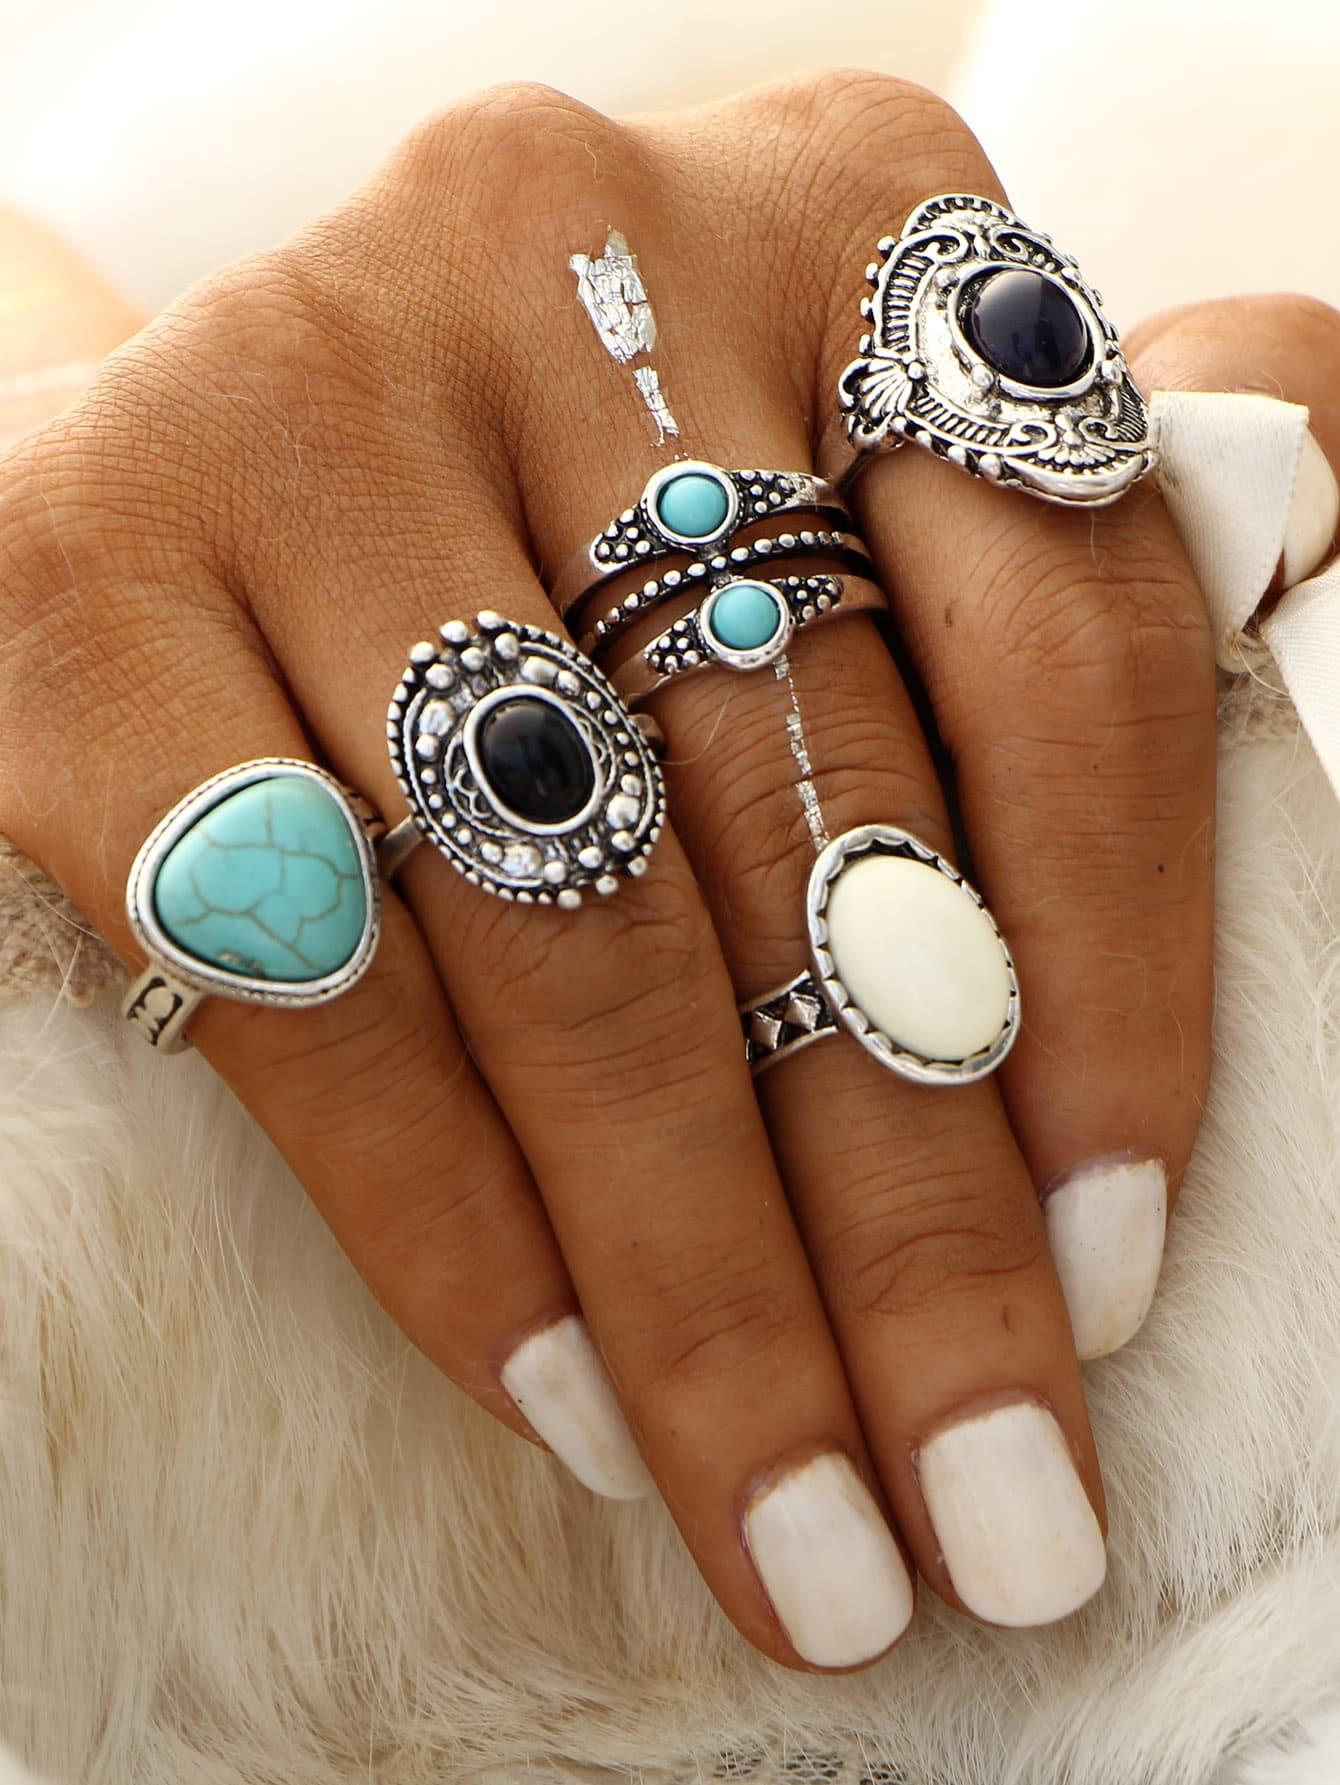 Schmuck-Trends 2019 übergroße Ringe orientalisch